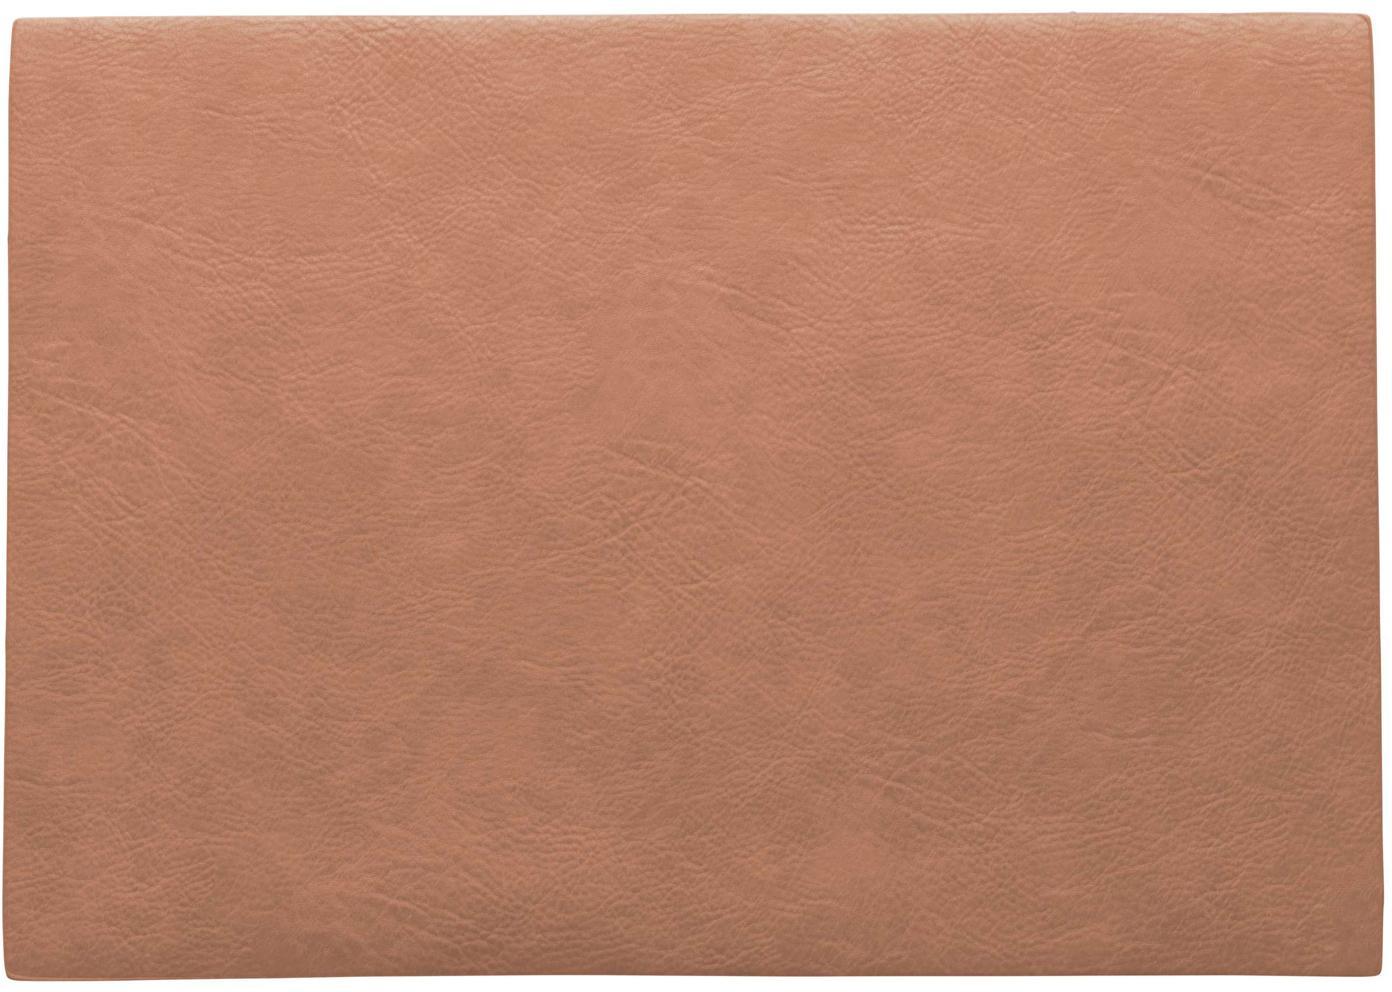 Tovaglietta americana in similpelle Plini 2 pz, Pelle vegana (poliuretano), Rosa corallo, Larg. 33 x Lung. 46 cm